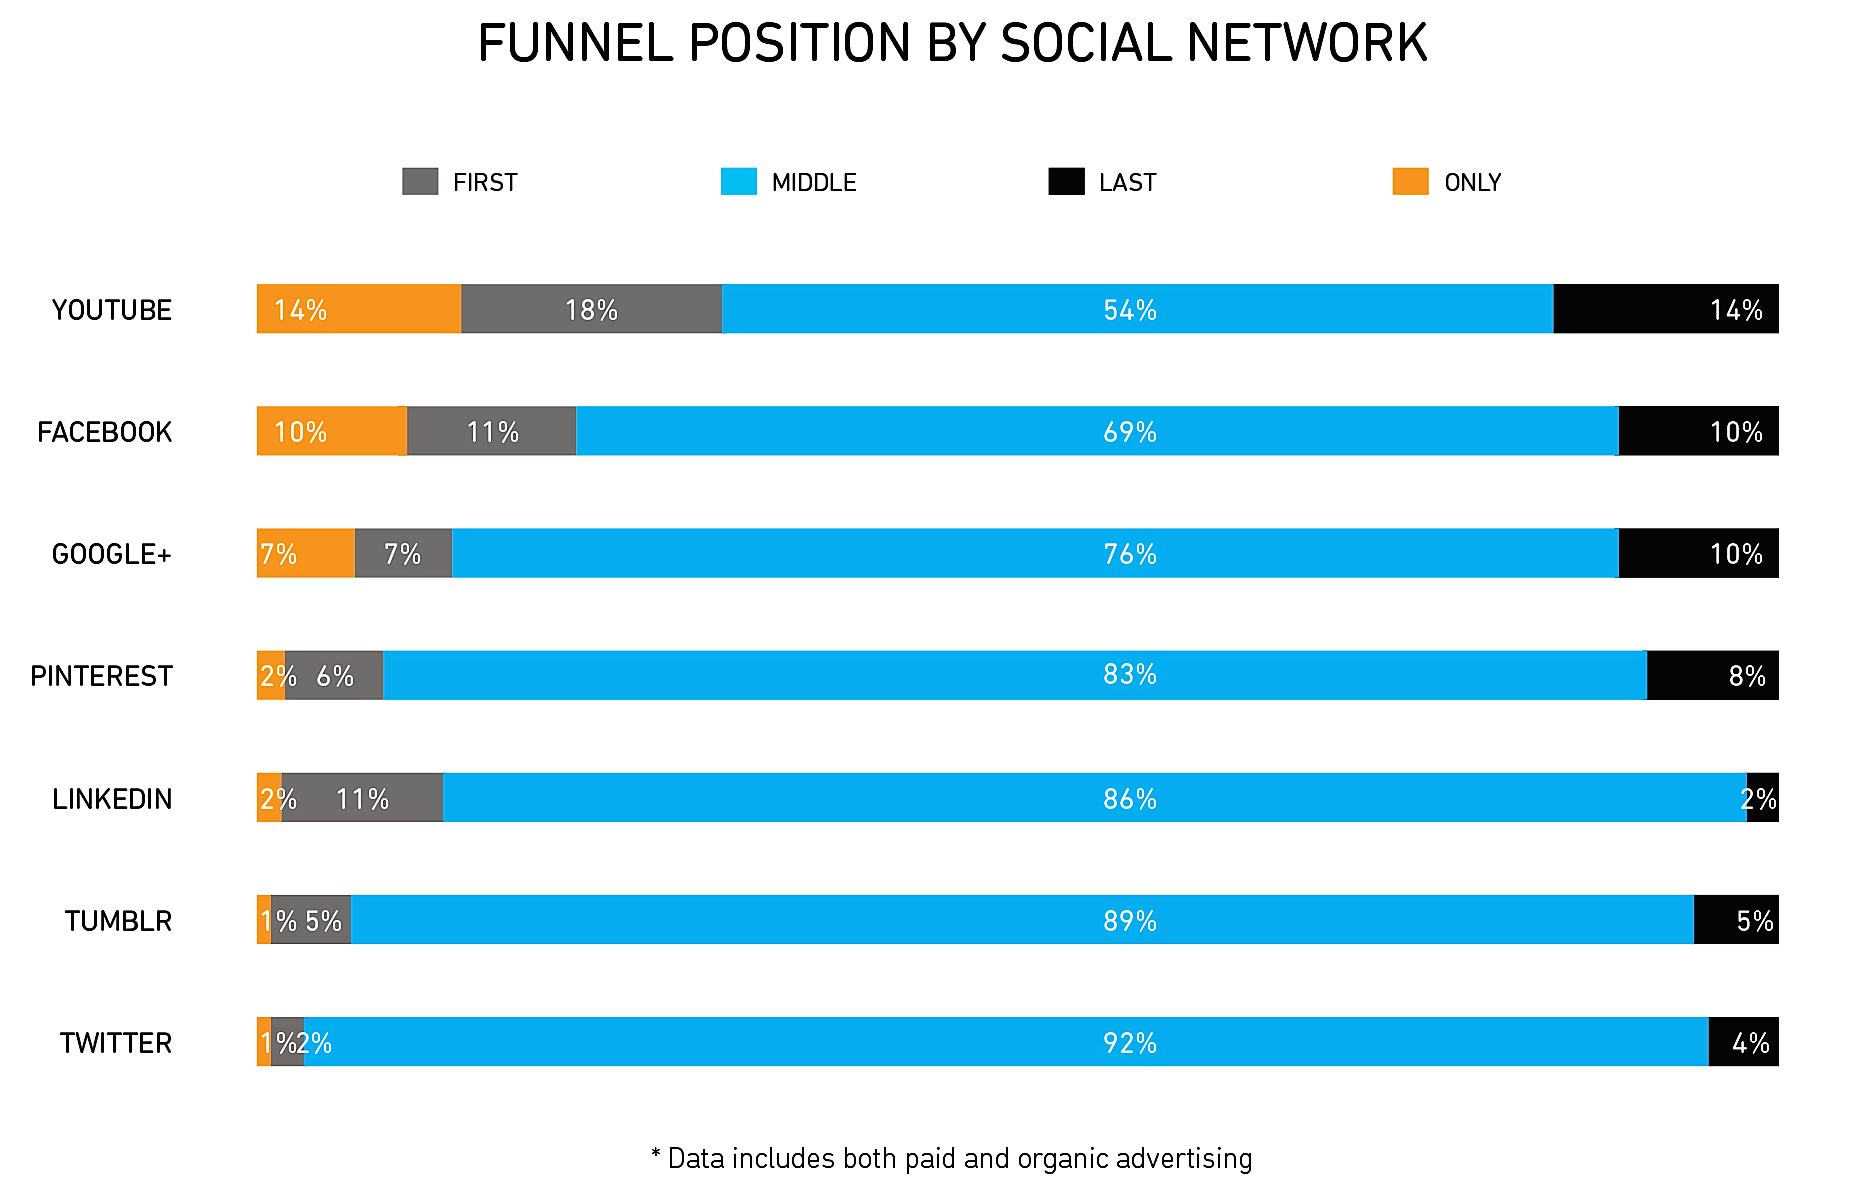 funnel-position-social-network